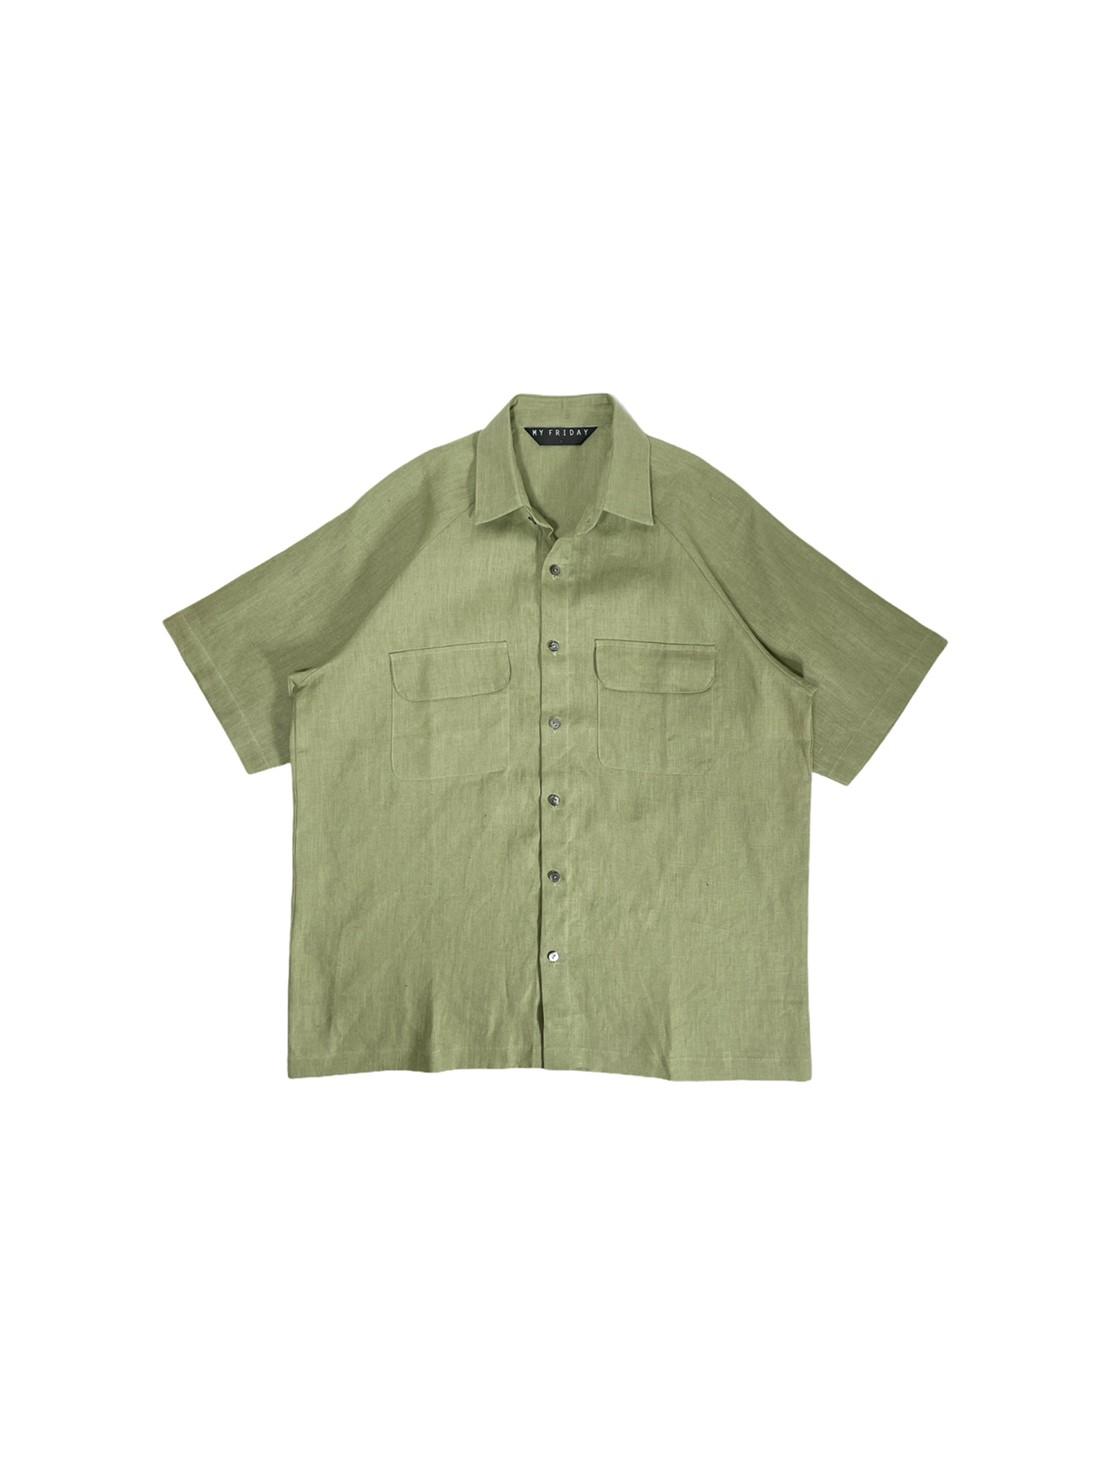 Raglan Sleeve Shirt With Pockets